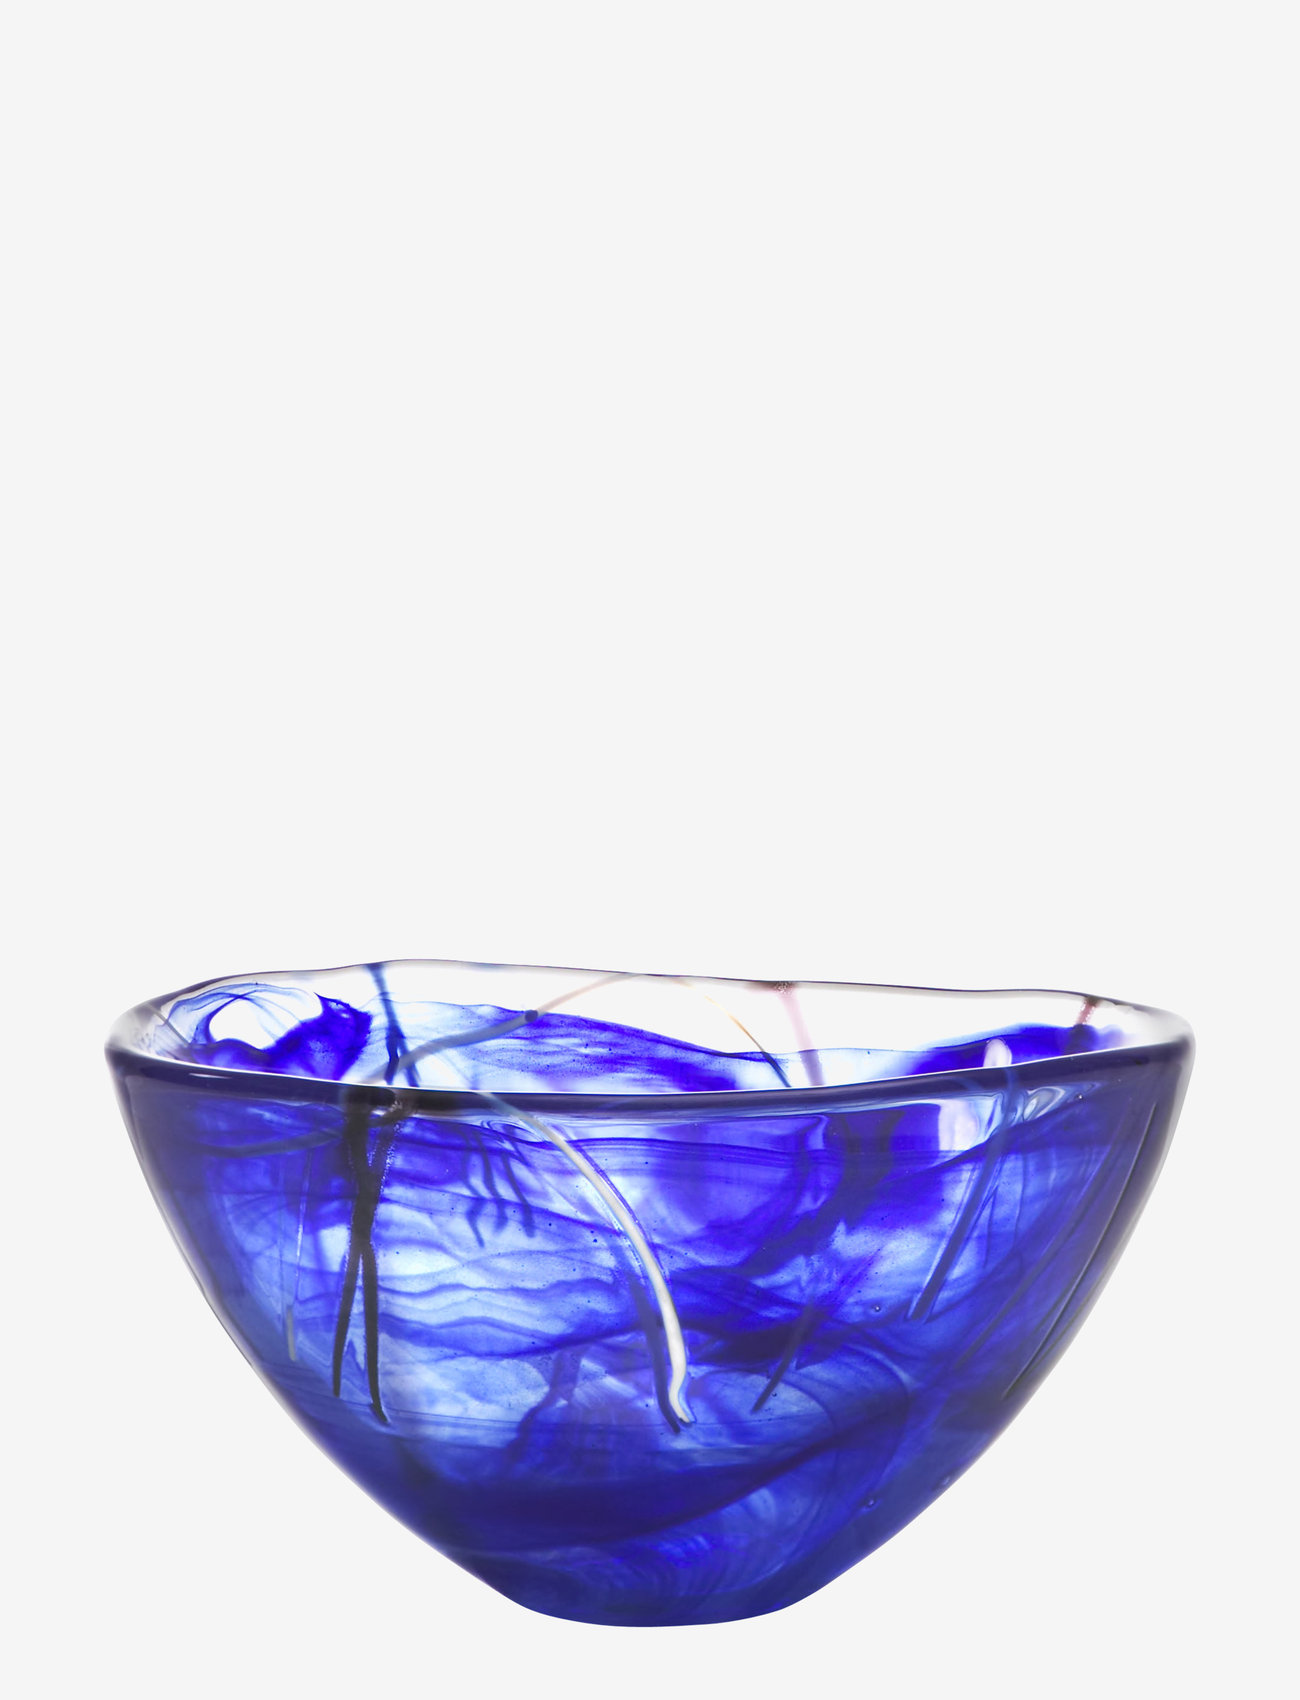 Kosta Boda - CONTRAST BLUE BOWL D 160MM - 100–200€ - blue - 0